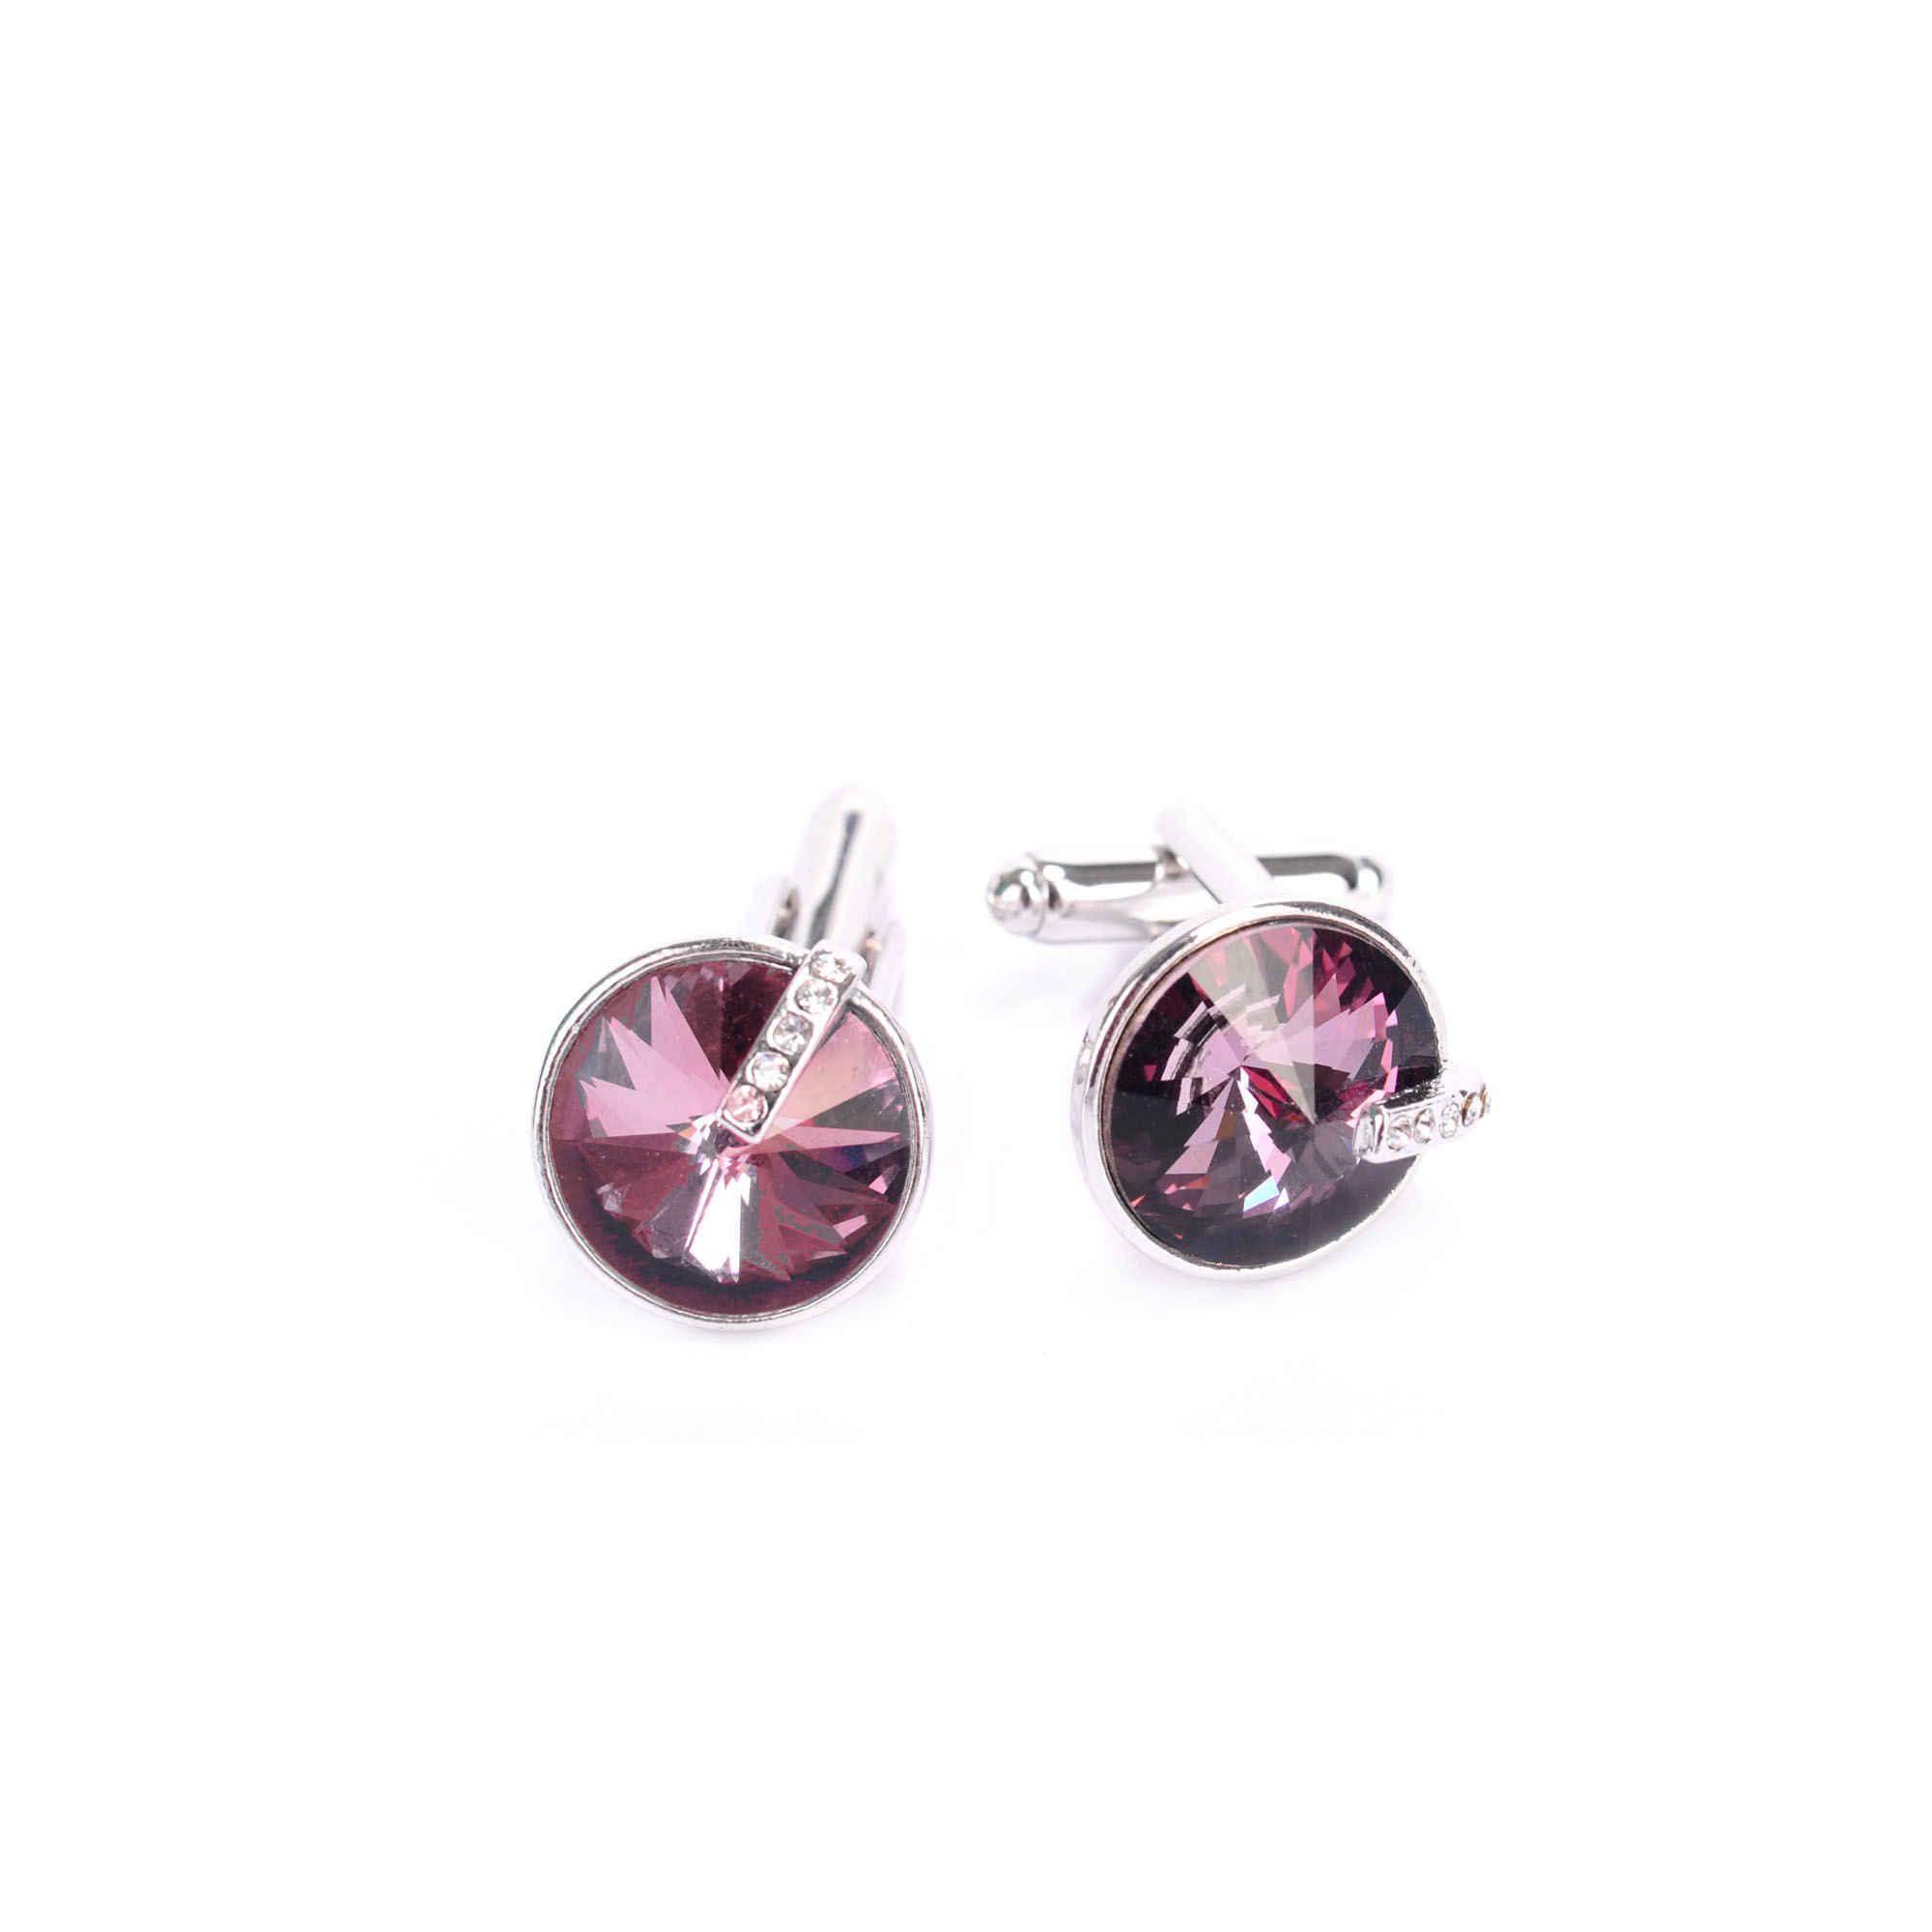 Deep Violet Circular Crystal Cufflinks made with elements from Swarovski